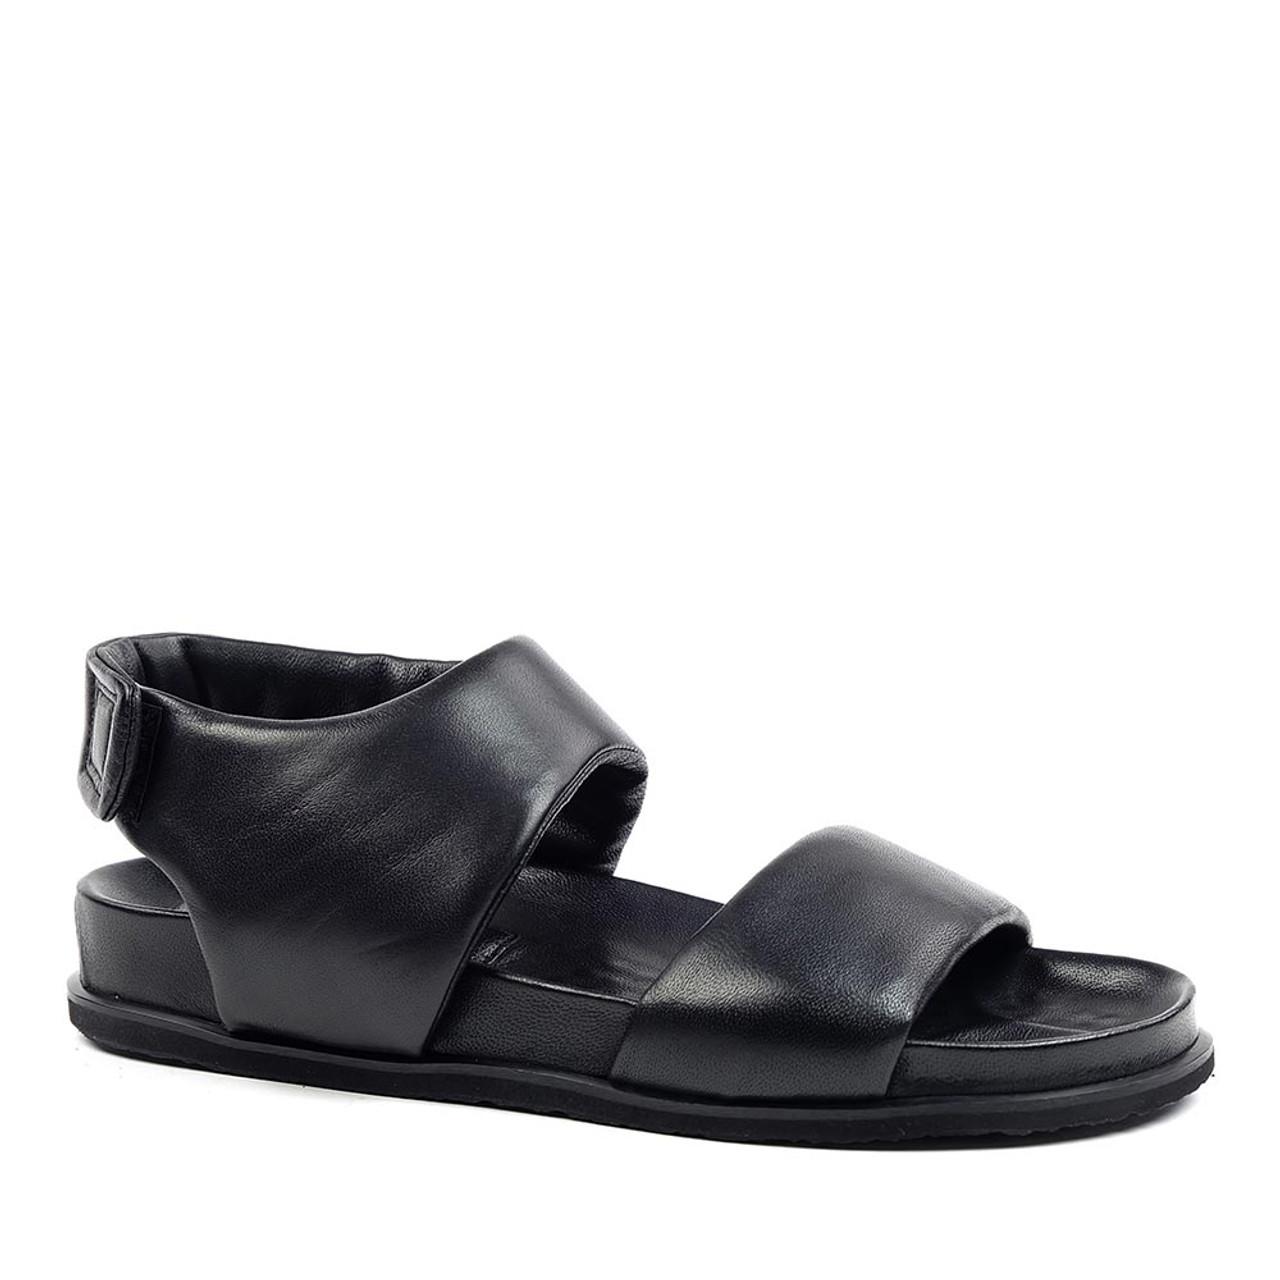 Lorenzo Masiero — Hanig's Footwear